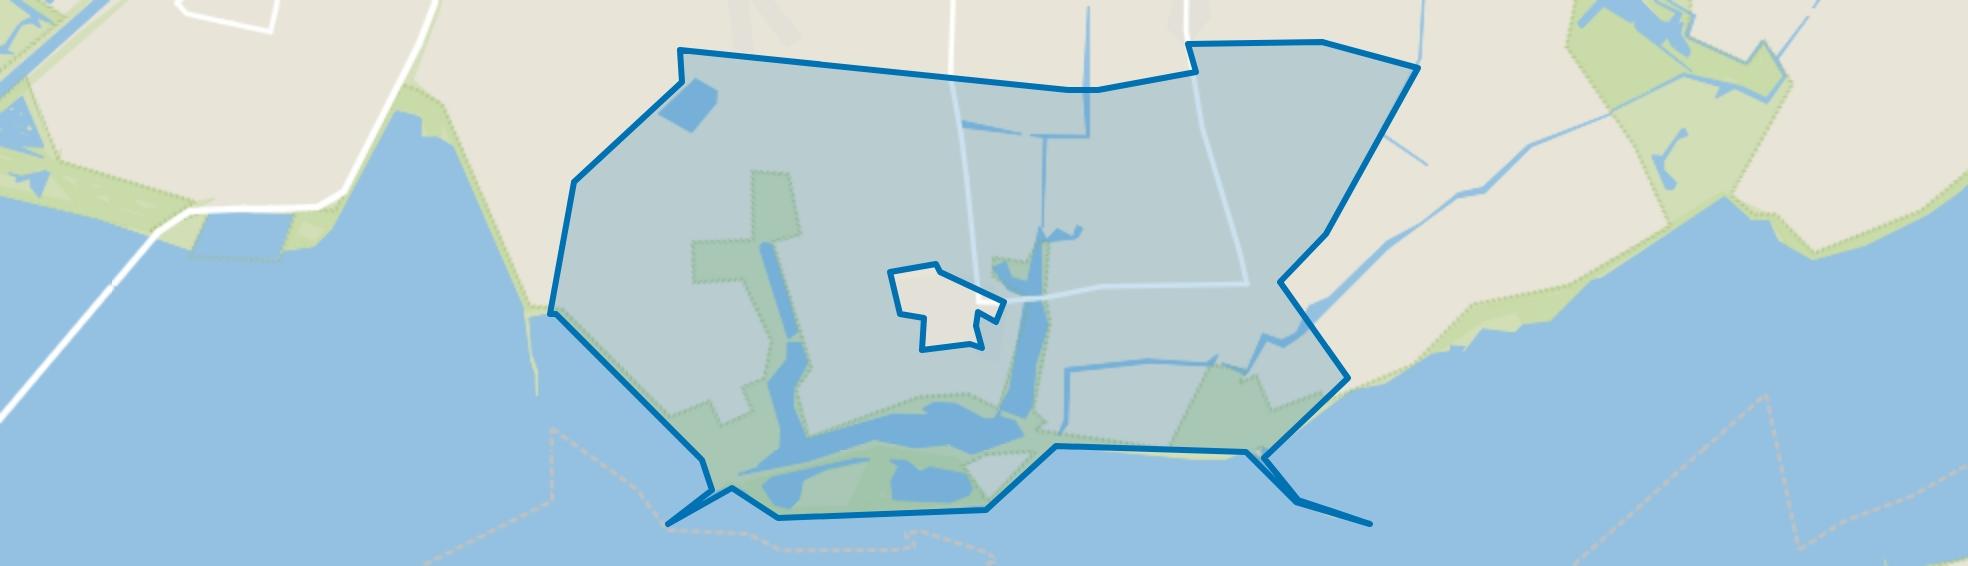 Verspreide huizen Ouwerkerk, Ouwerkerk map